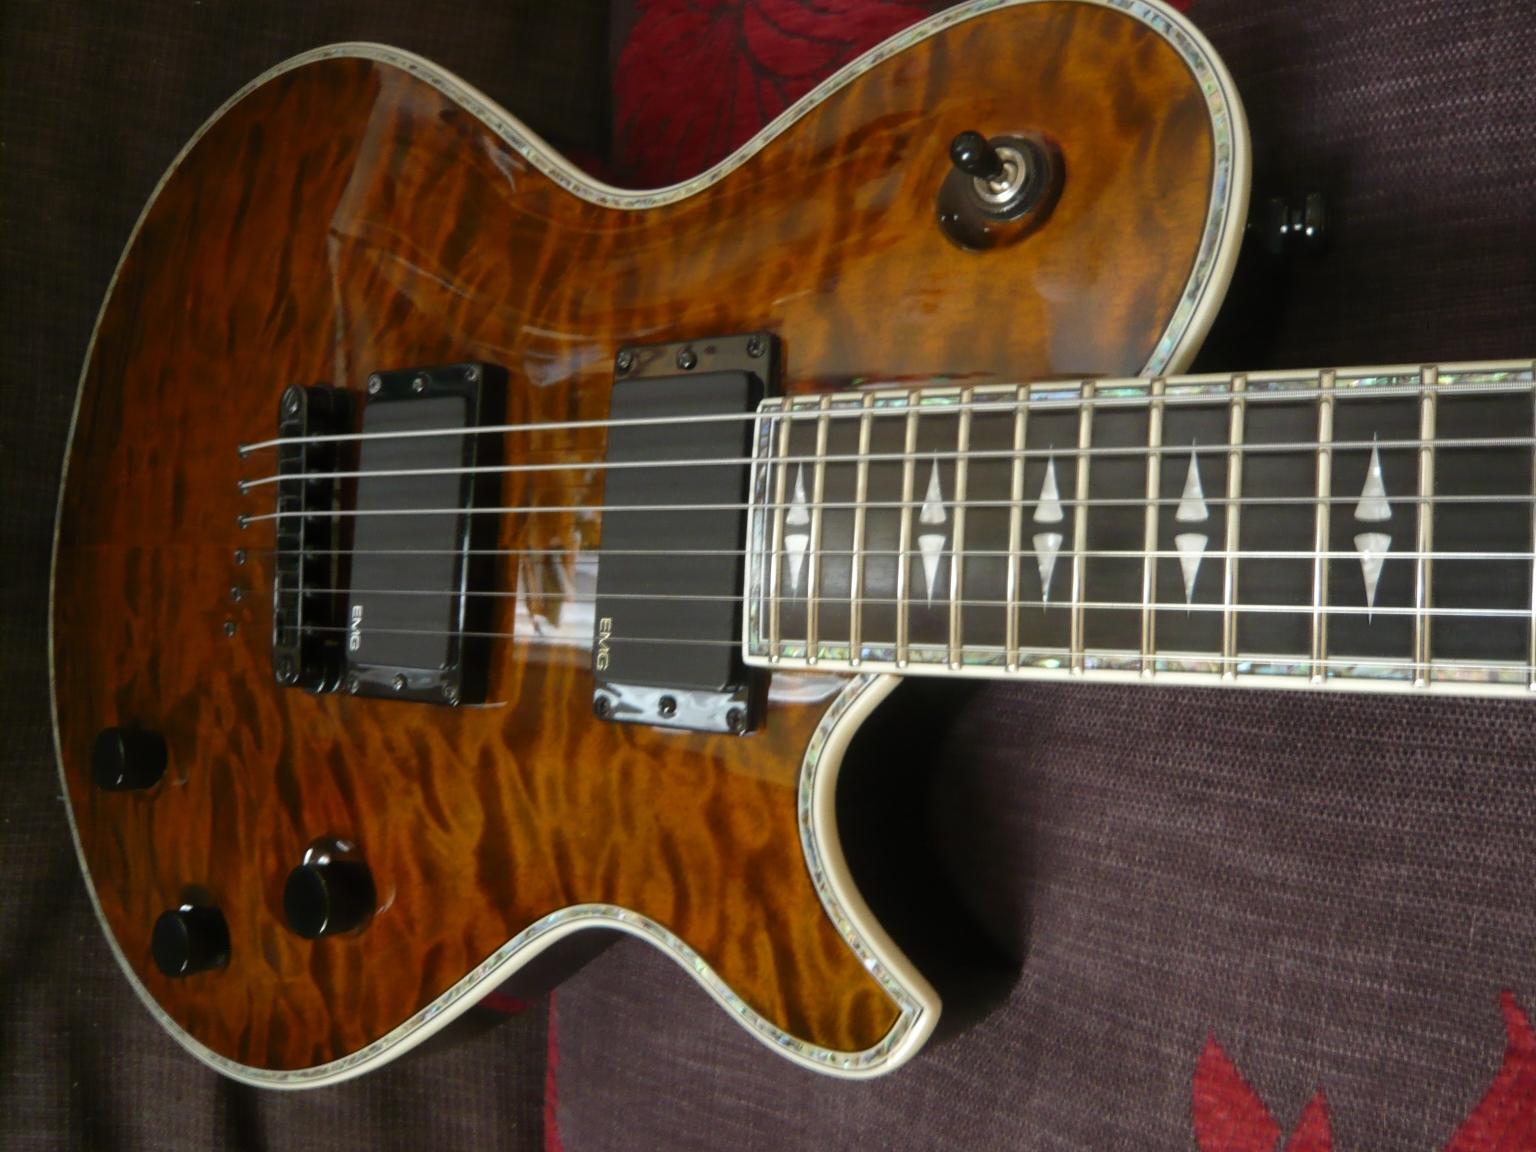 Michael Kelly Guitars : michael kelly guitars patriot premium image 161161 audiofanzine ~ Russianpoet.info Haus und Dekorationen